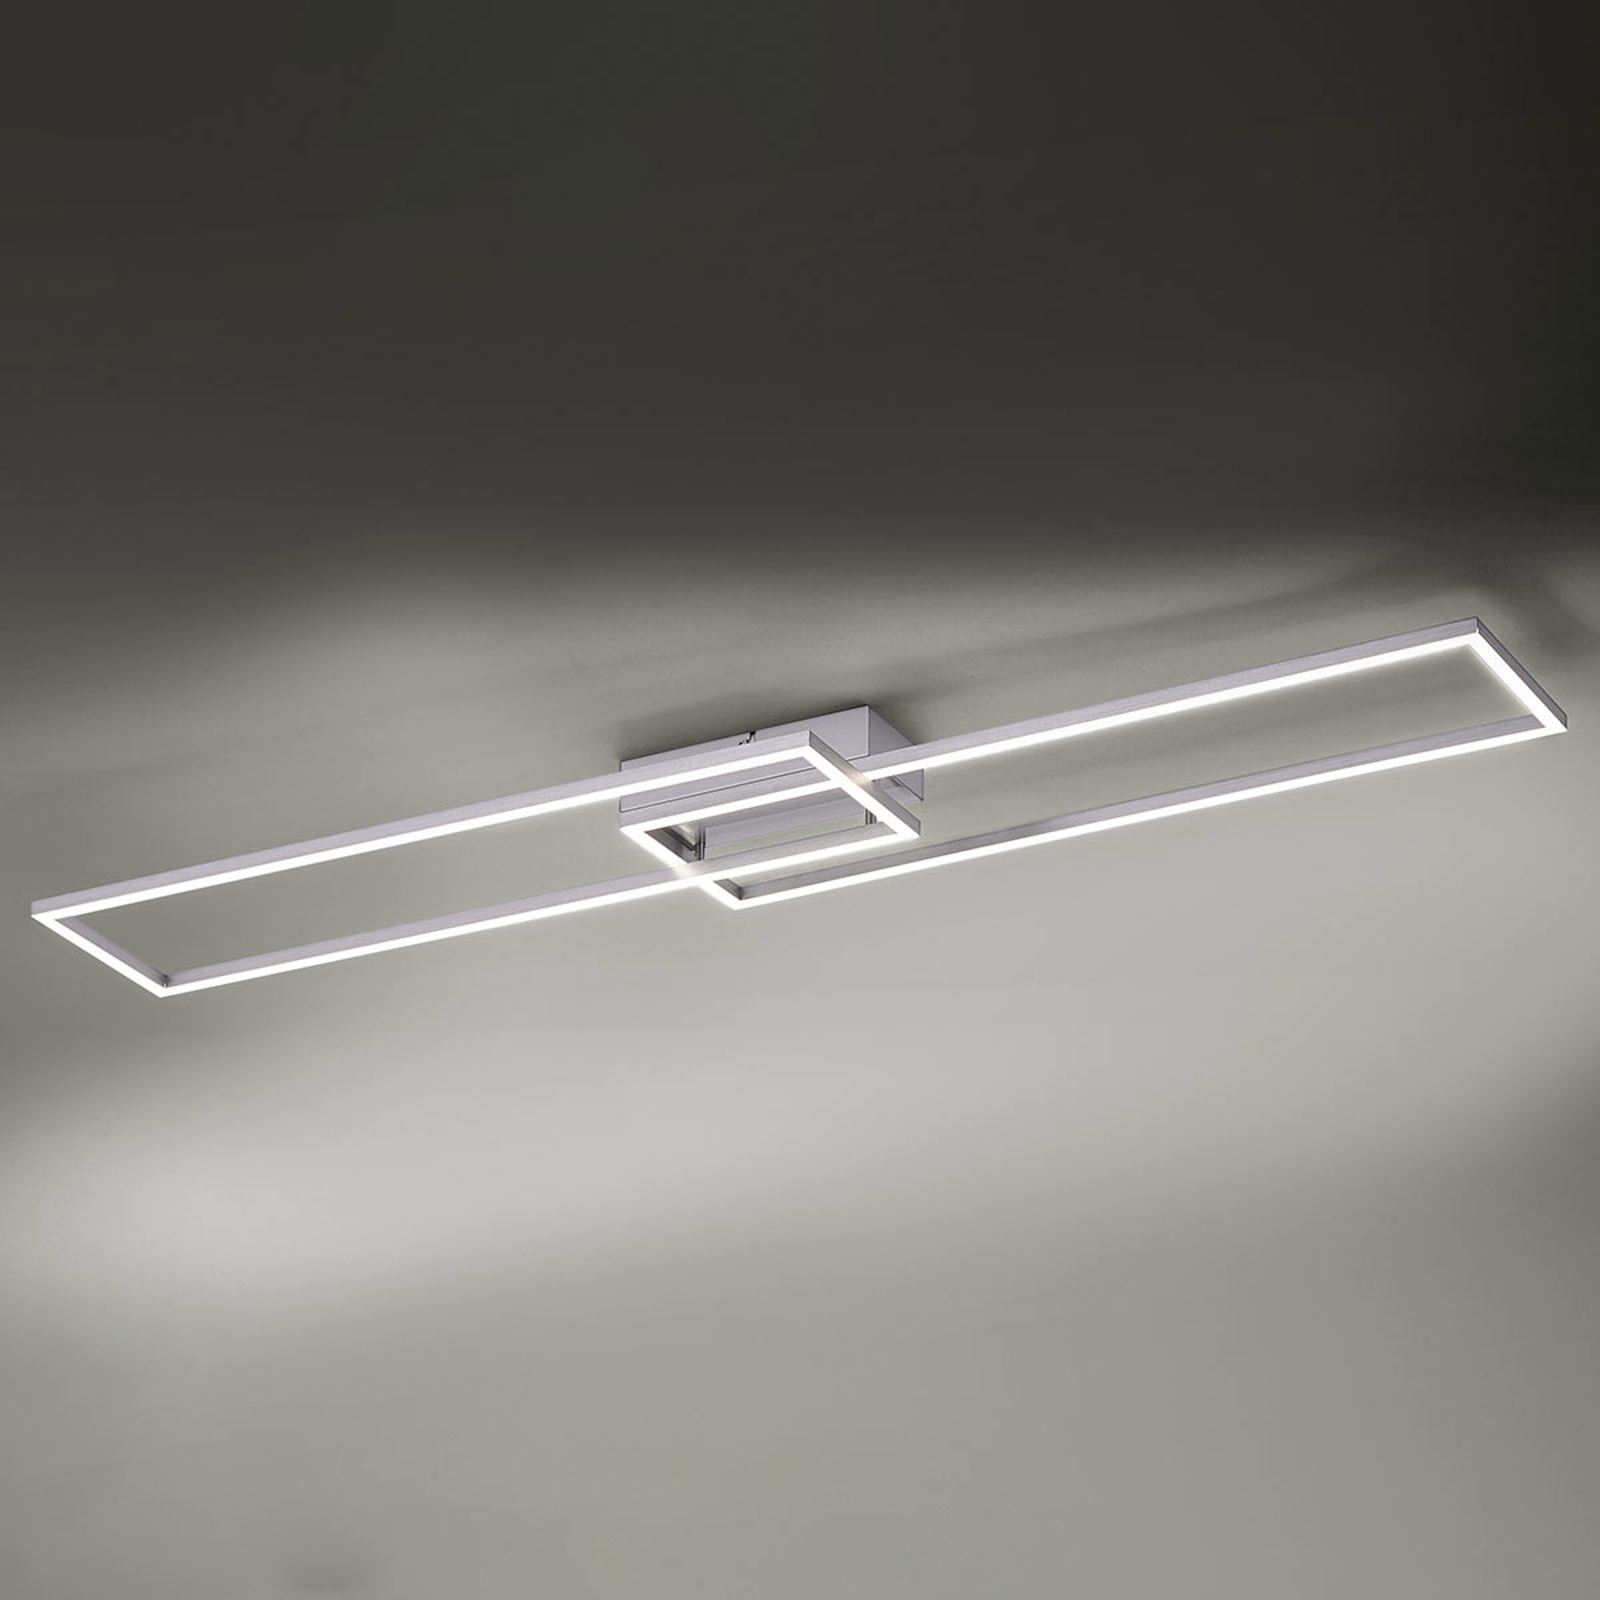 Lampa sufitowa LED Iven z pilotem 110 cm